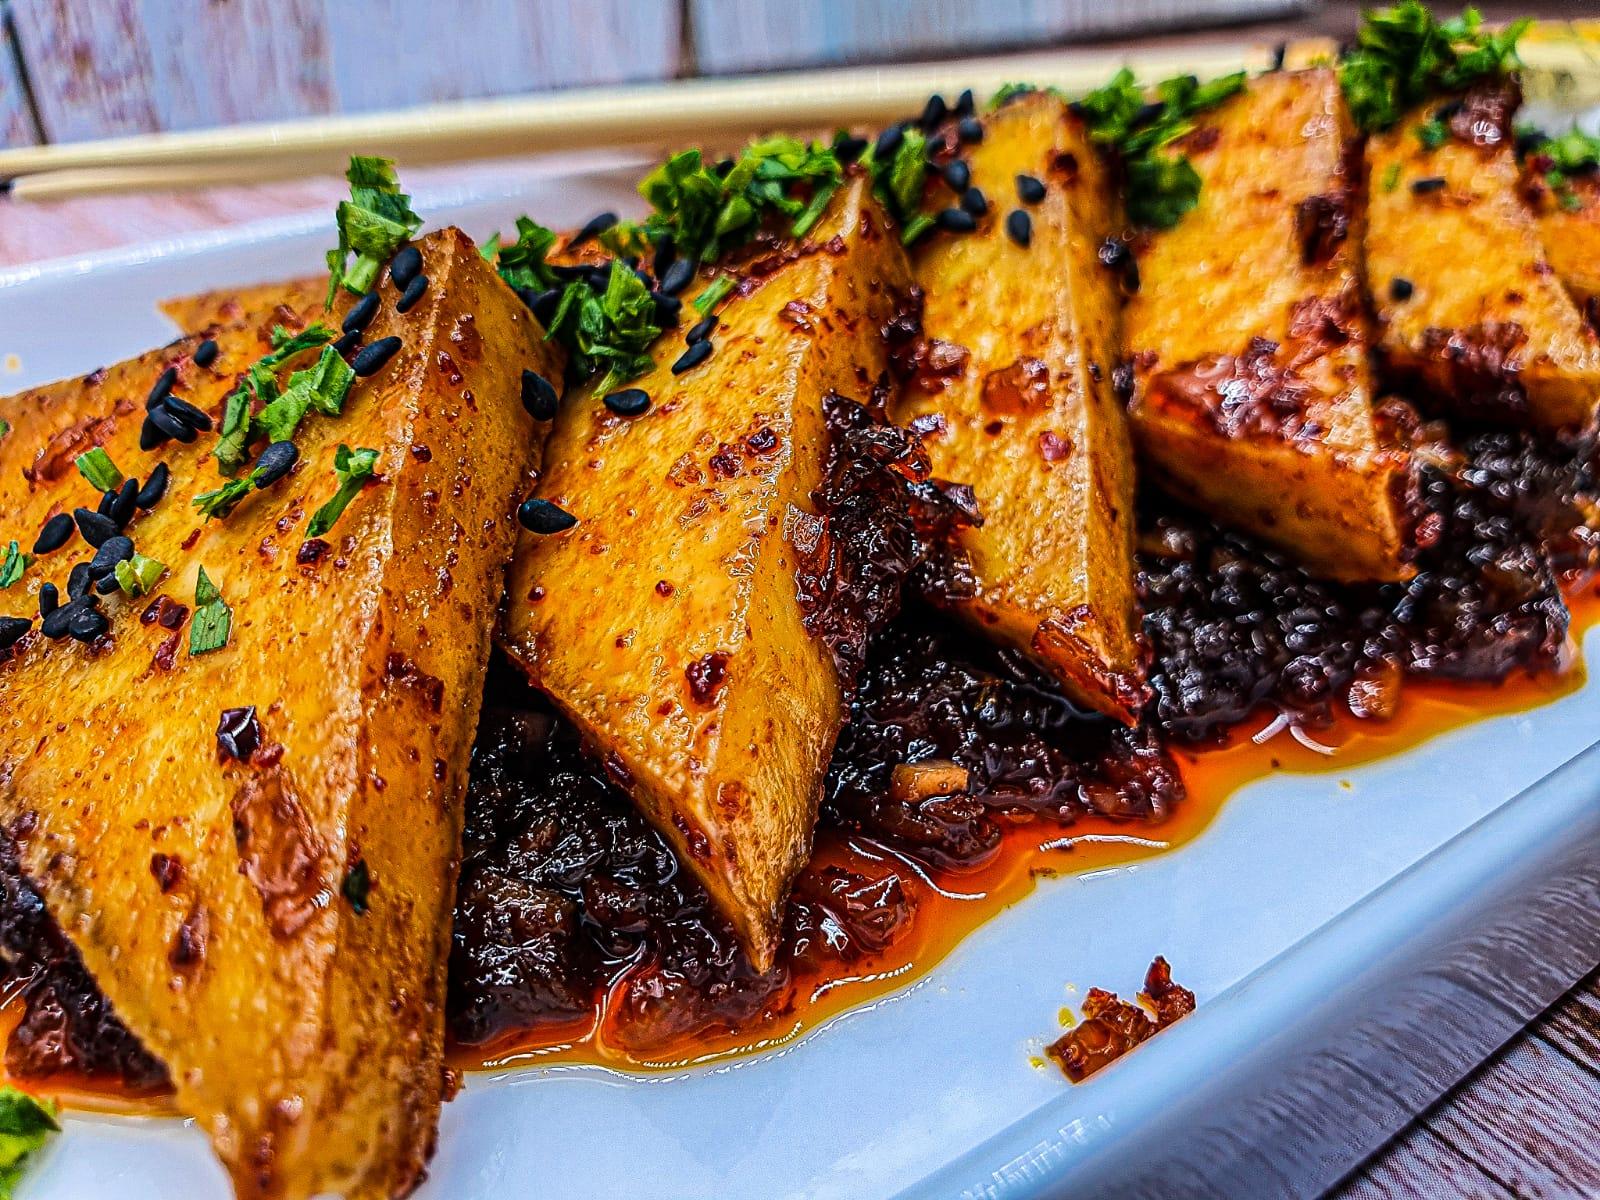 Vegan Recipes Cacao-Shamaness Korean Braised Tofu Sweet and Spicy